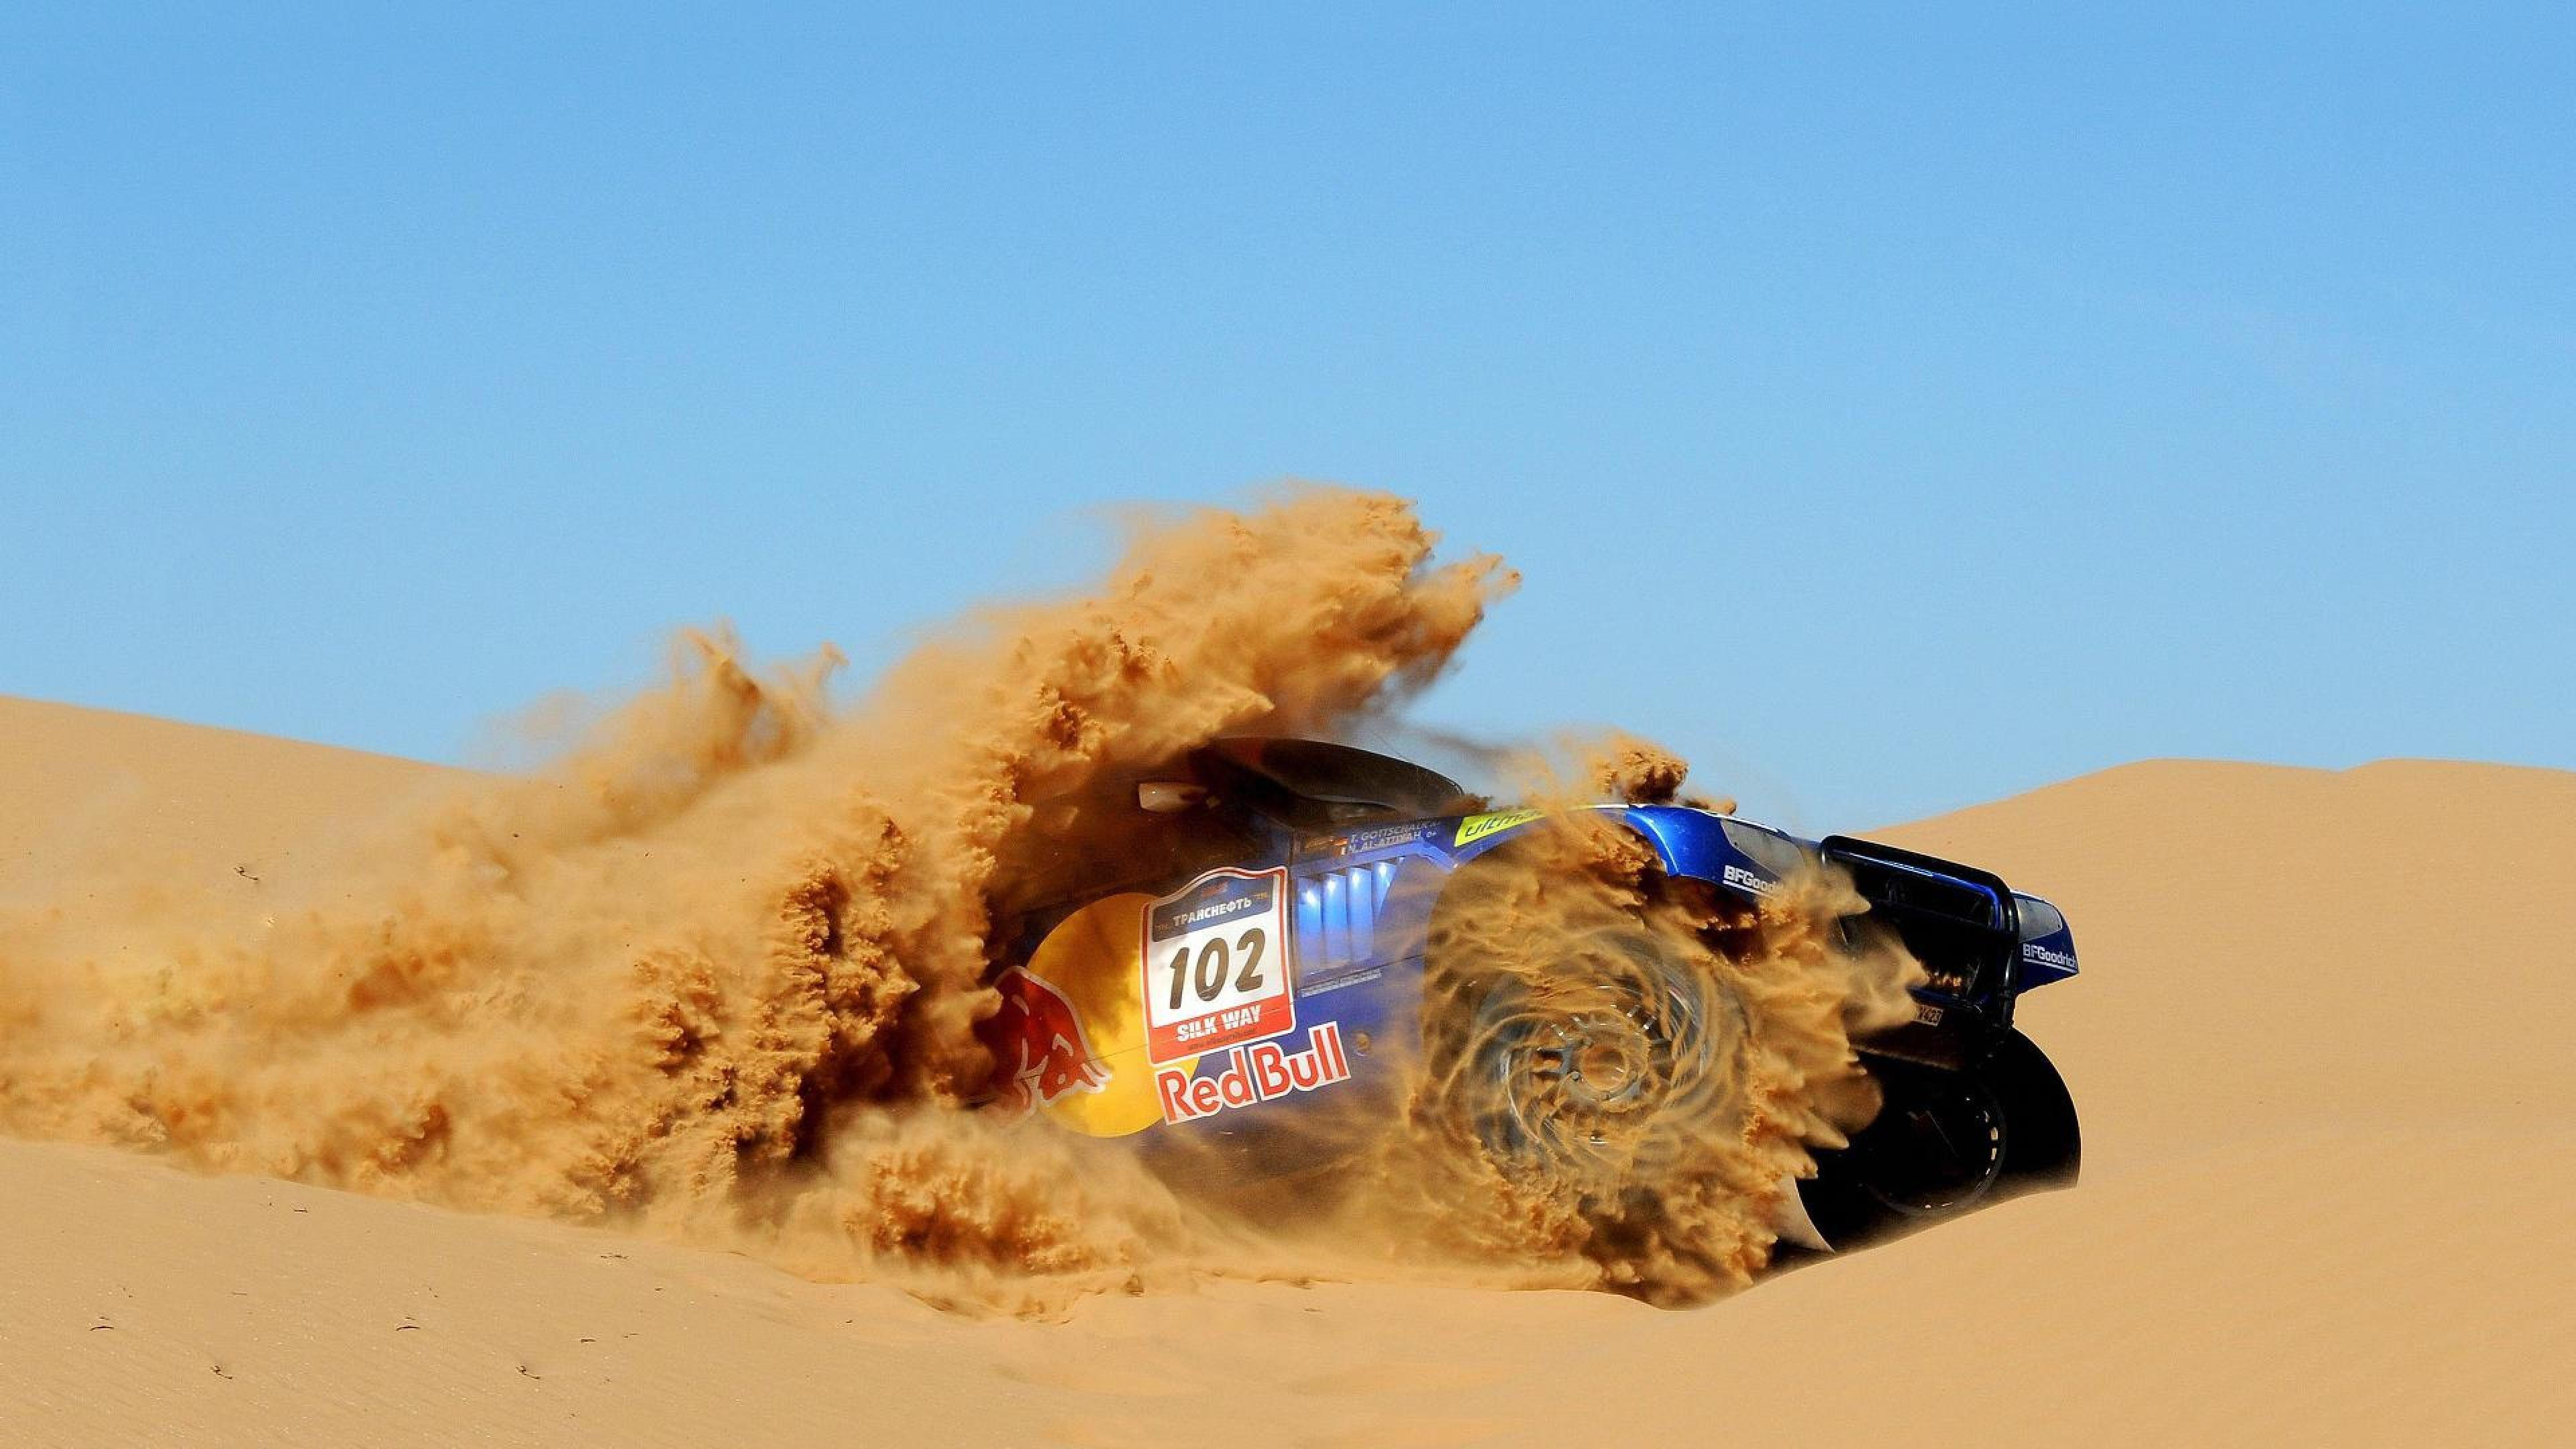 Dakar rally Red bull Sand Rally cars HD Wallpapers, Desktop ...